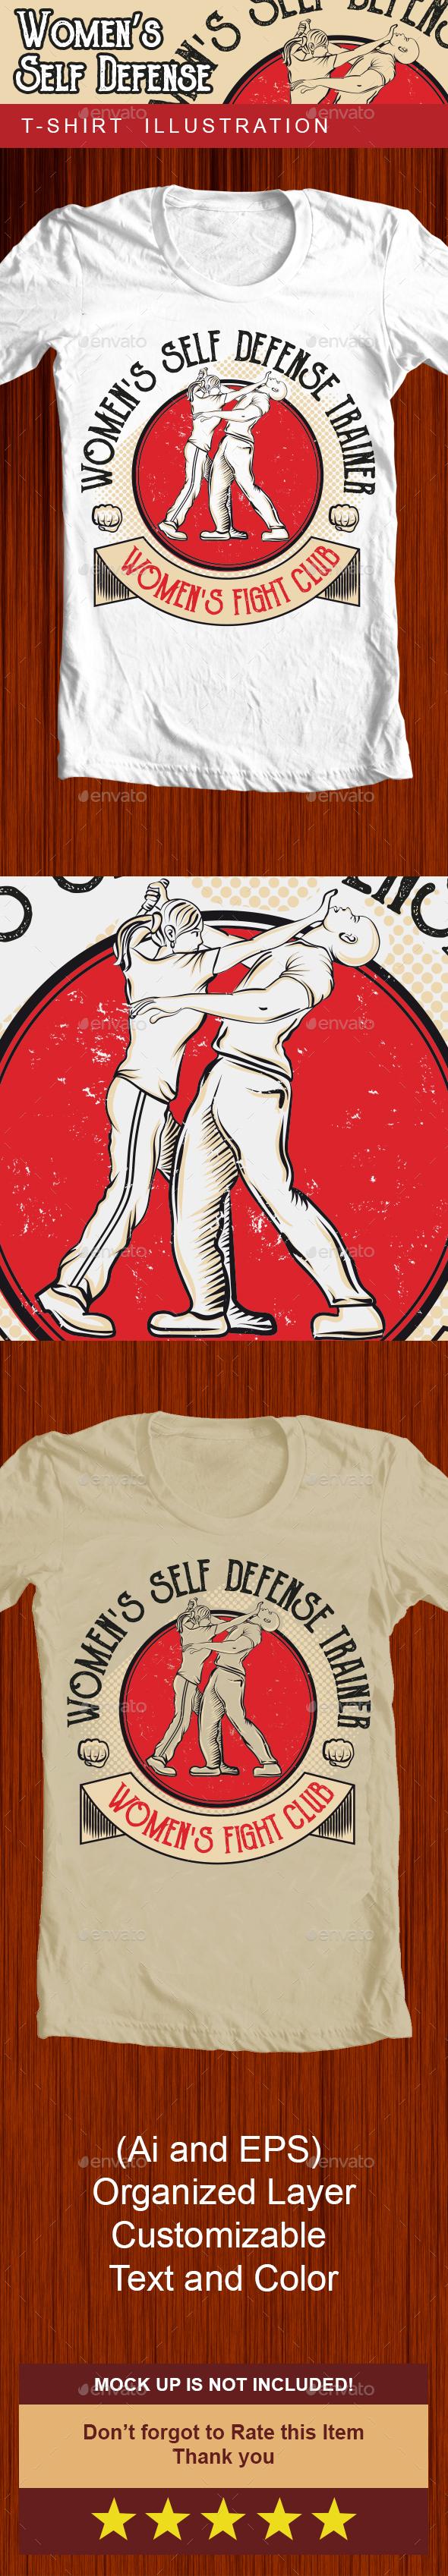 Women's self defense - Tshirt Illustration - Sports & Teams T-Shirts